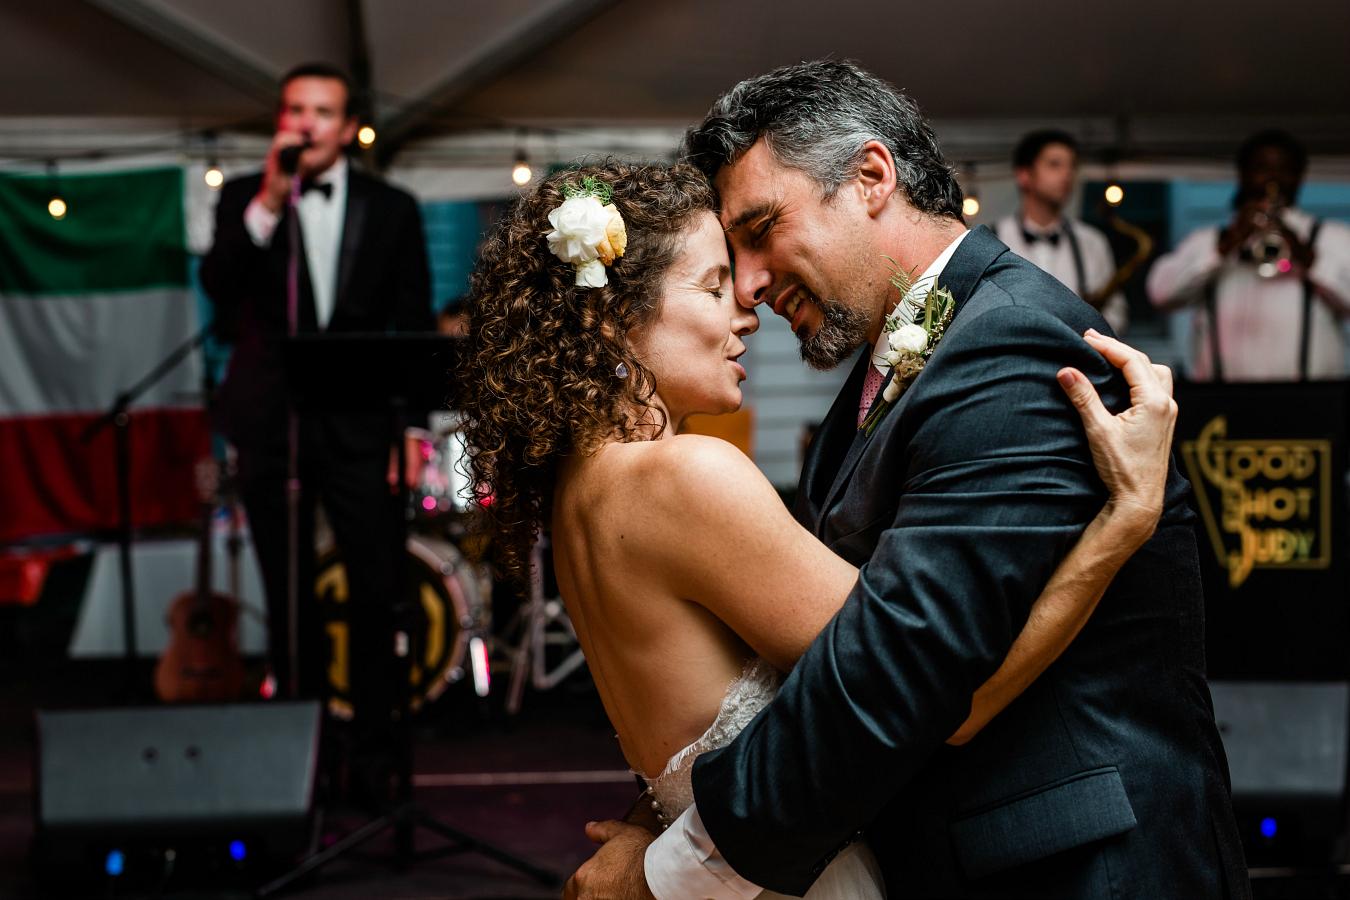 Virginia Wedding Bands to Hire